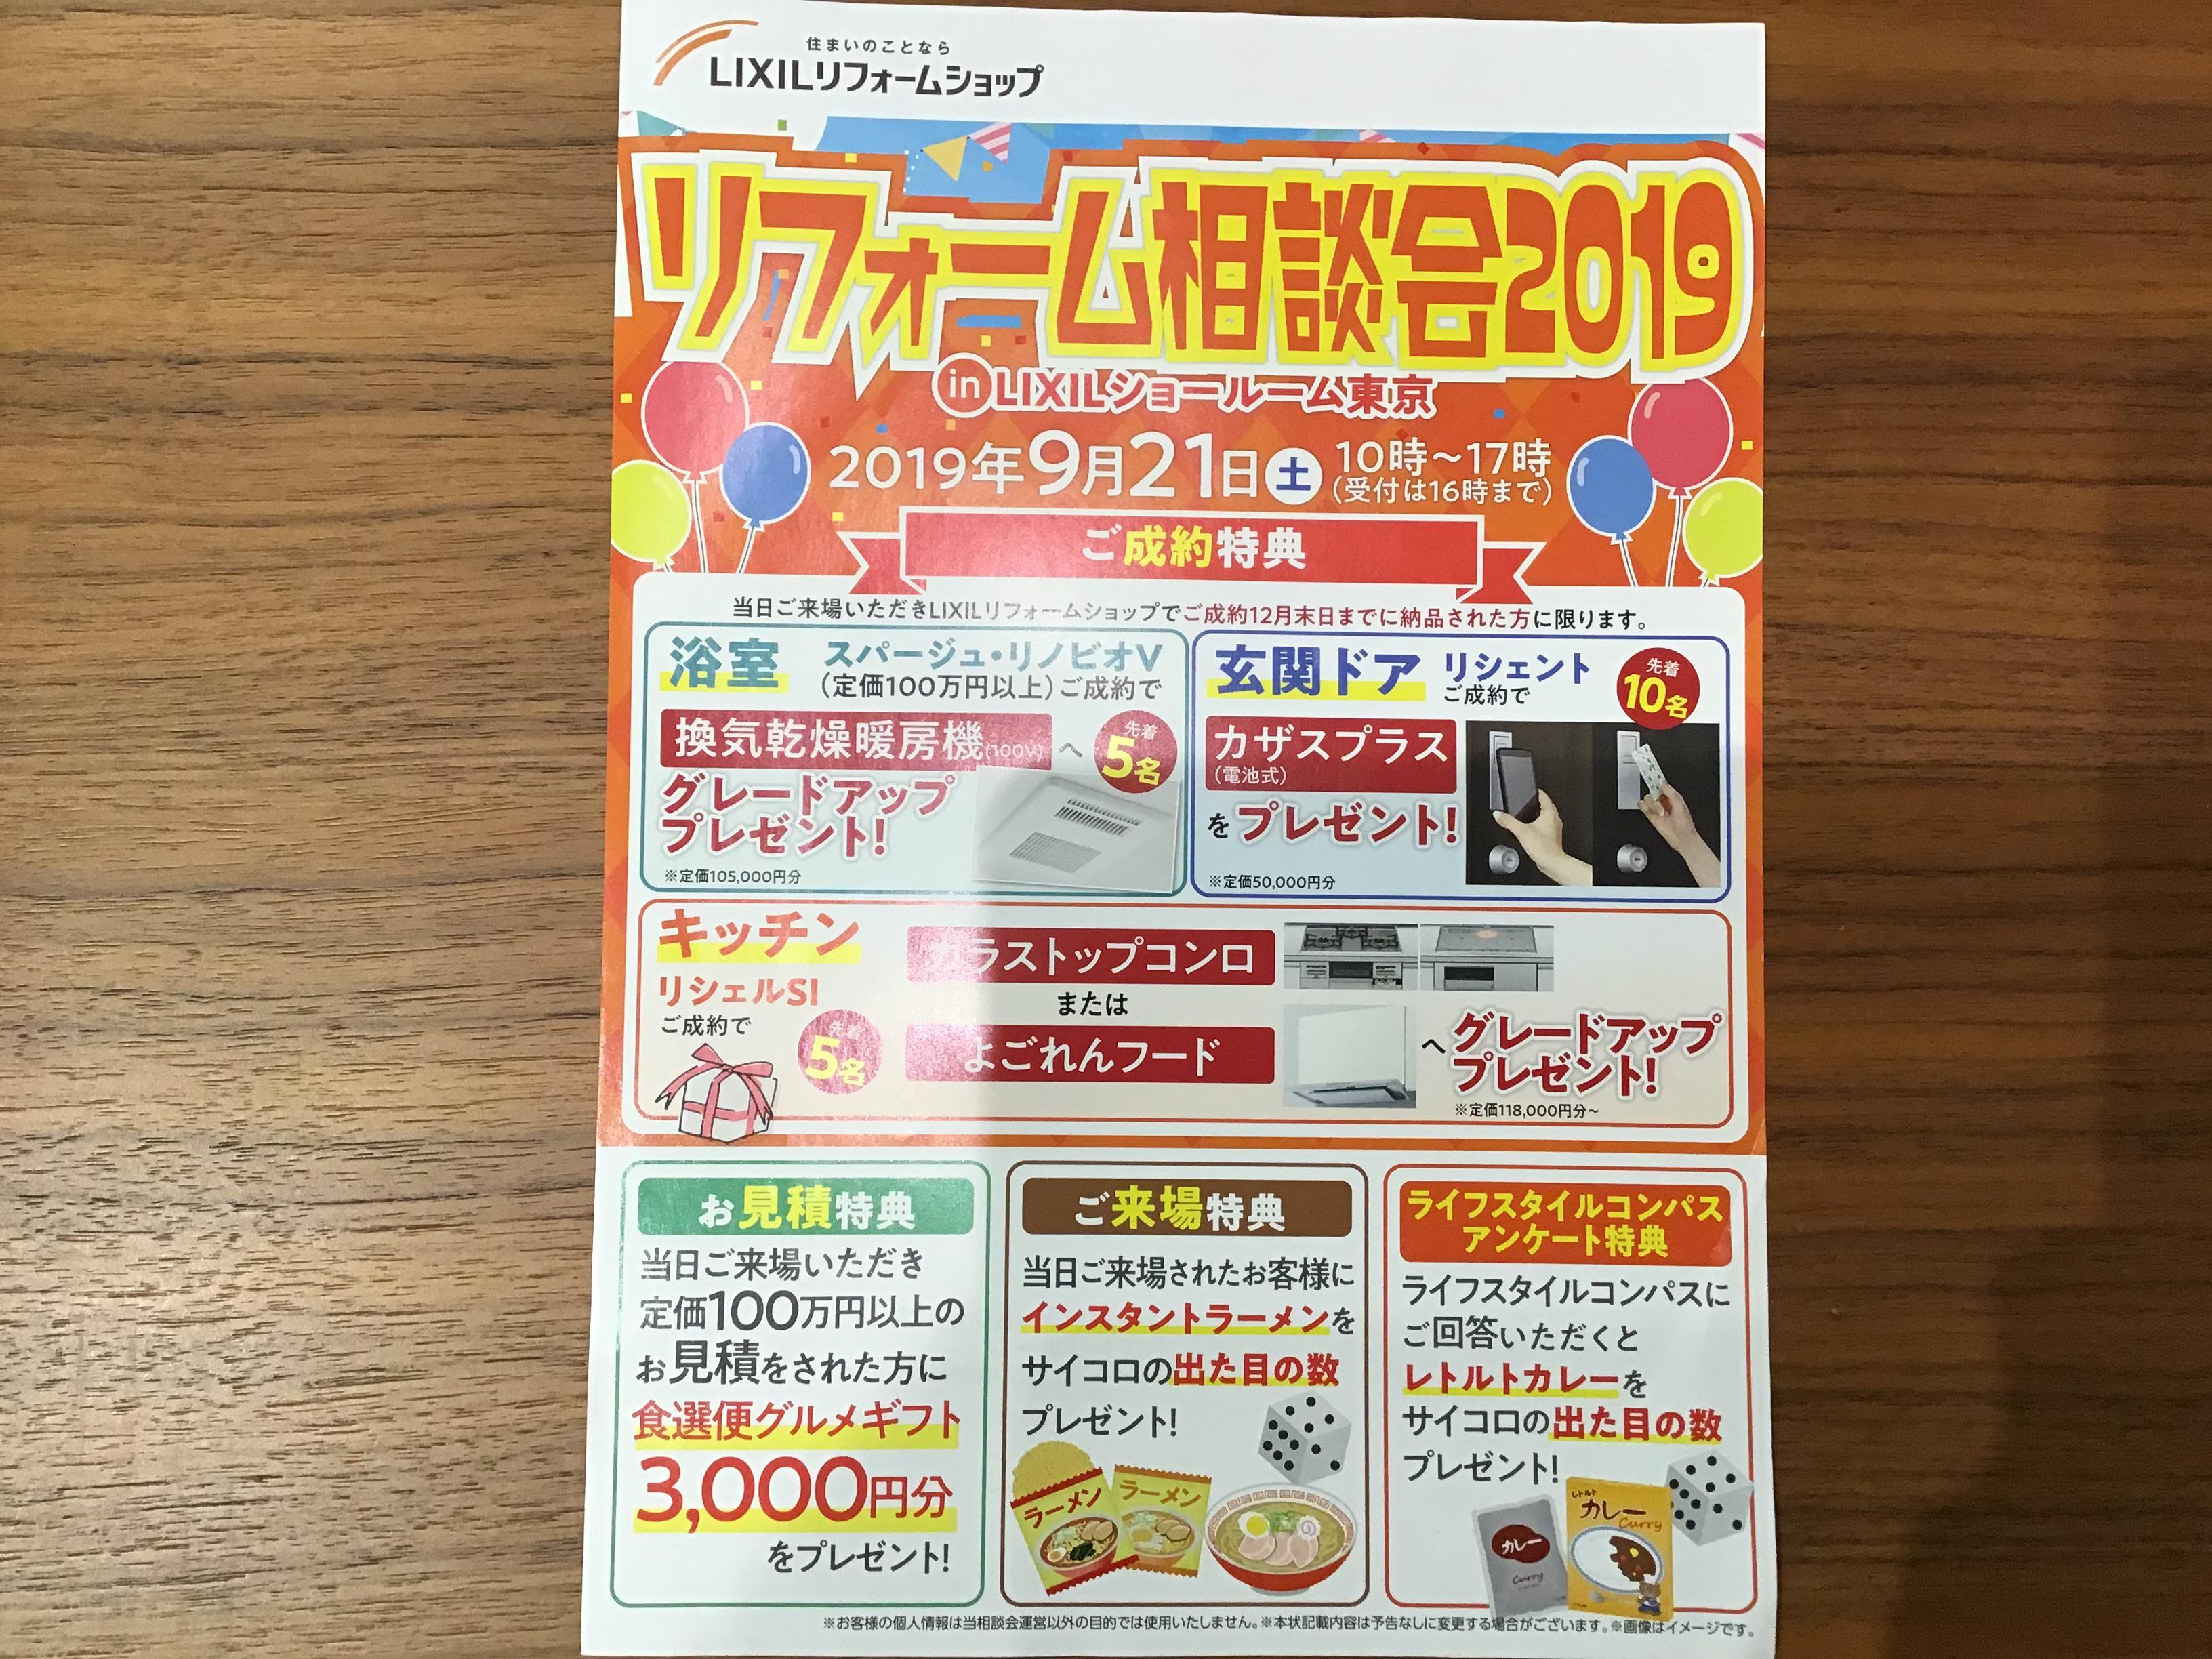 LIXILリフォームショップ リフォーム相談会2019